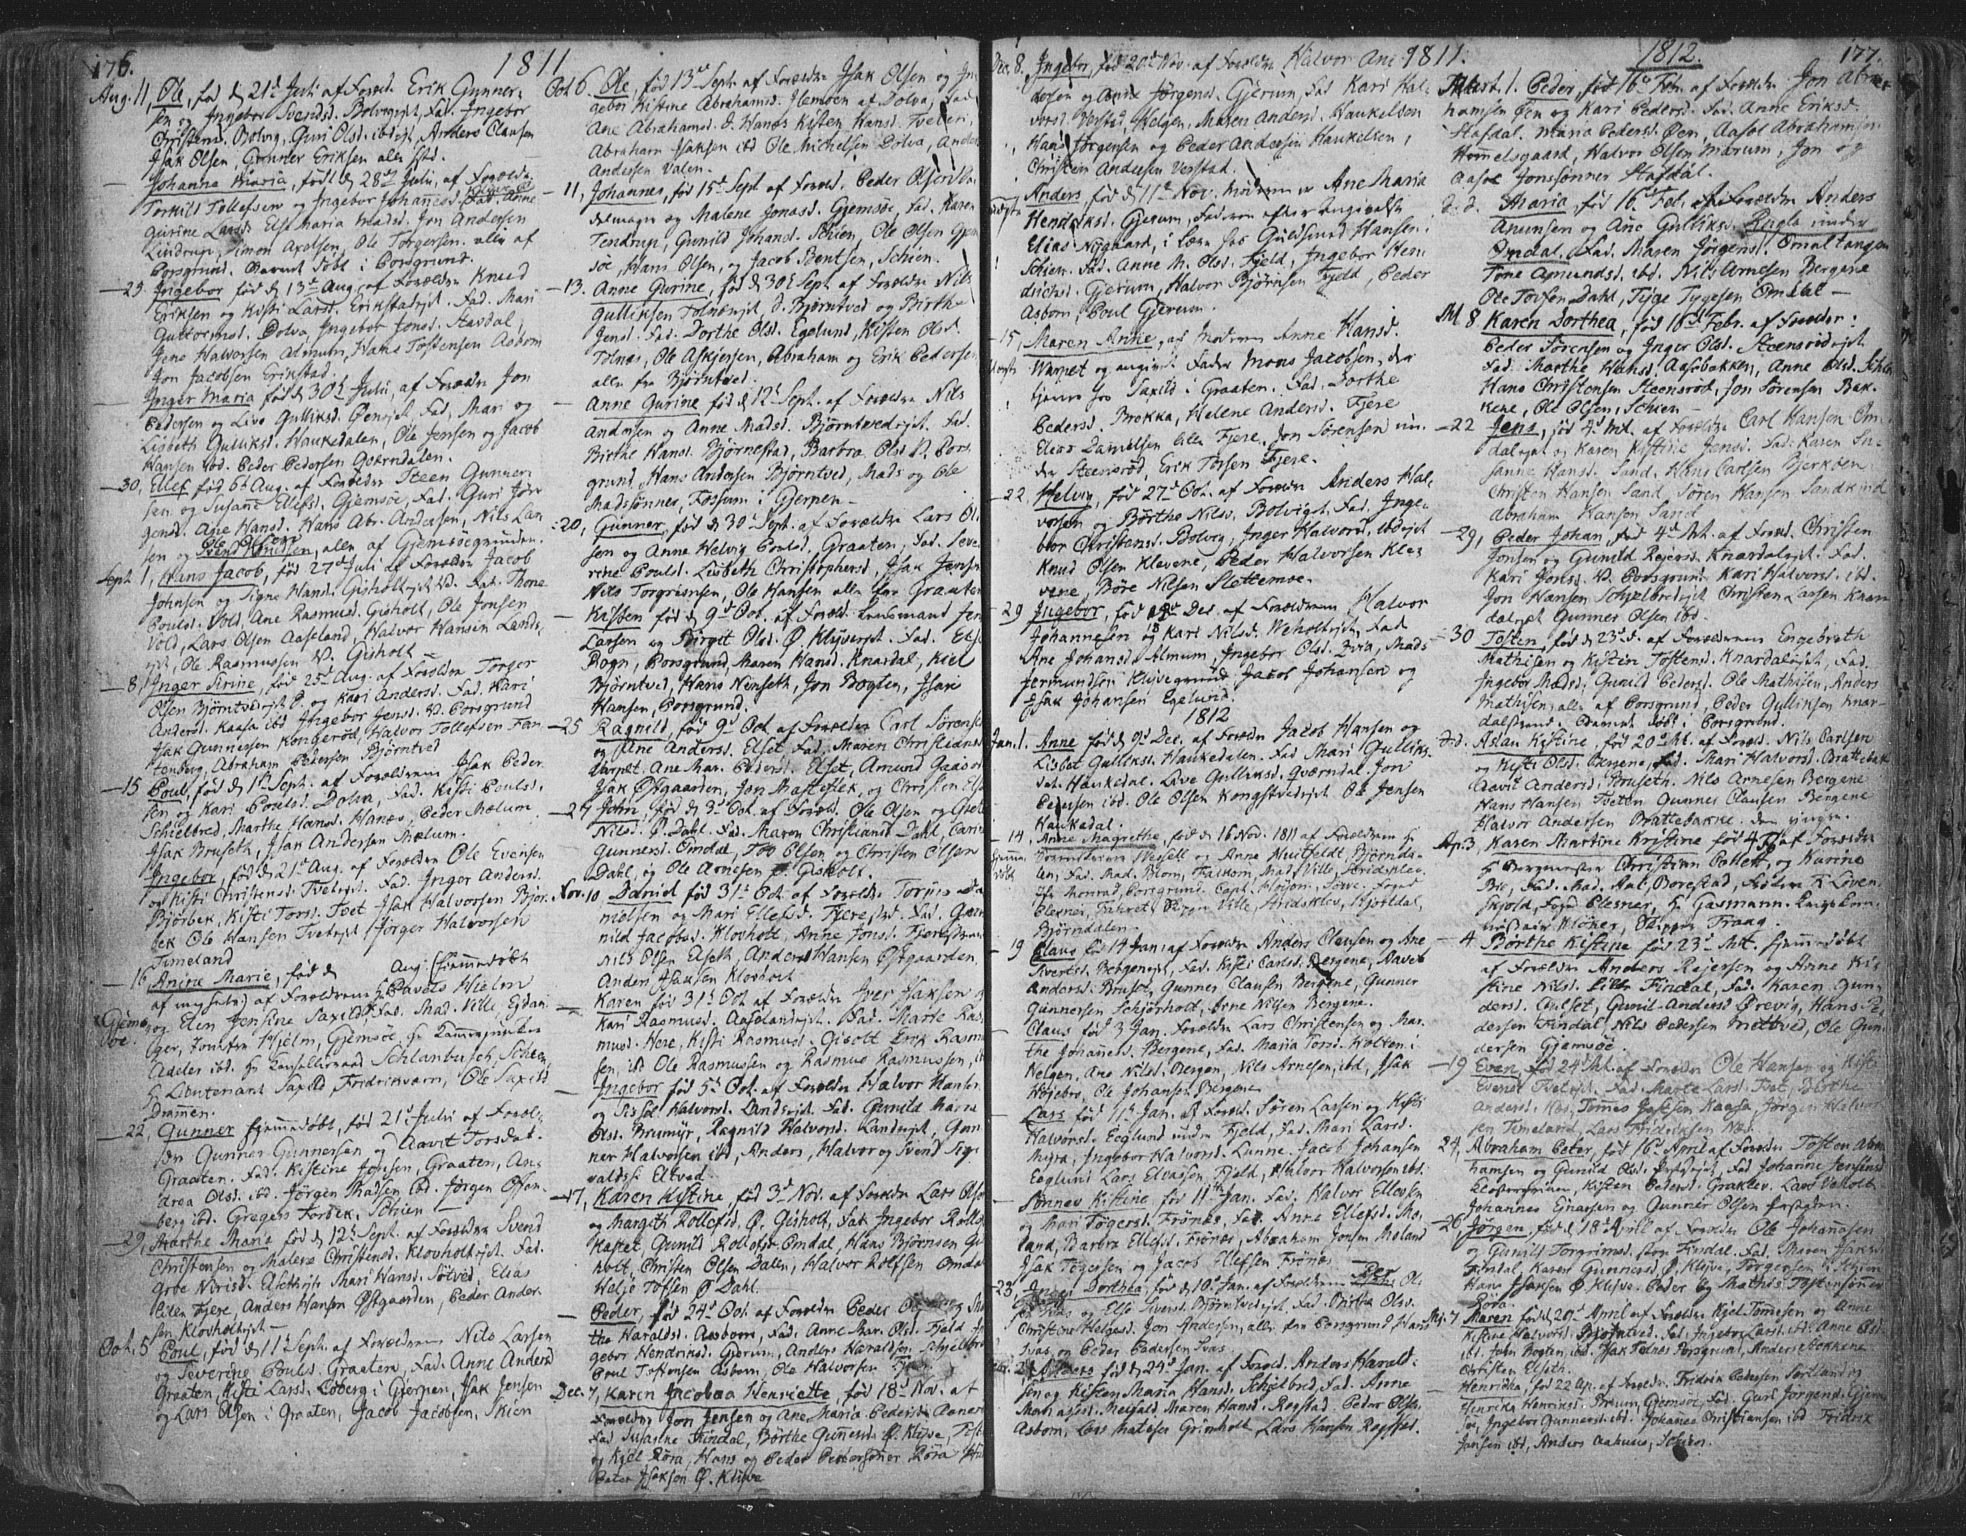 SAKO, Solum kirkebøker, F/Fa/L0003: Ministerialbok nr. I 3, 1761-1814, s. 176-177